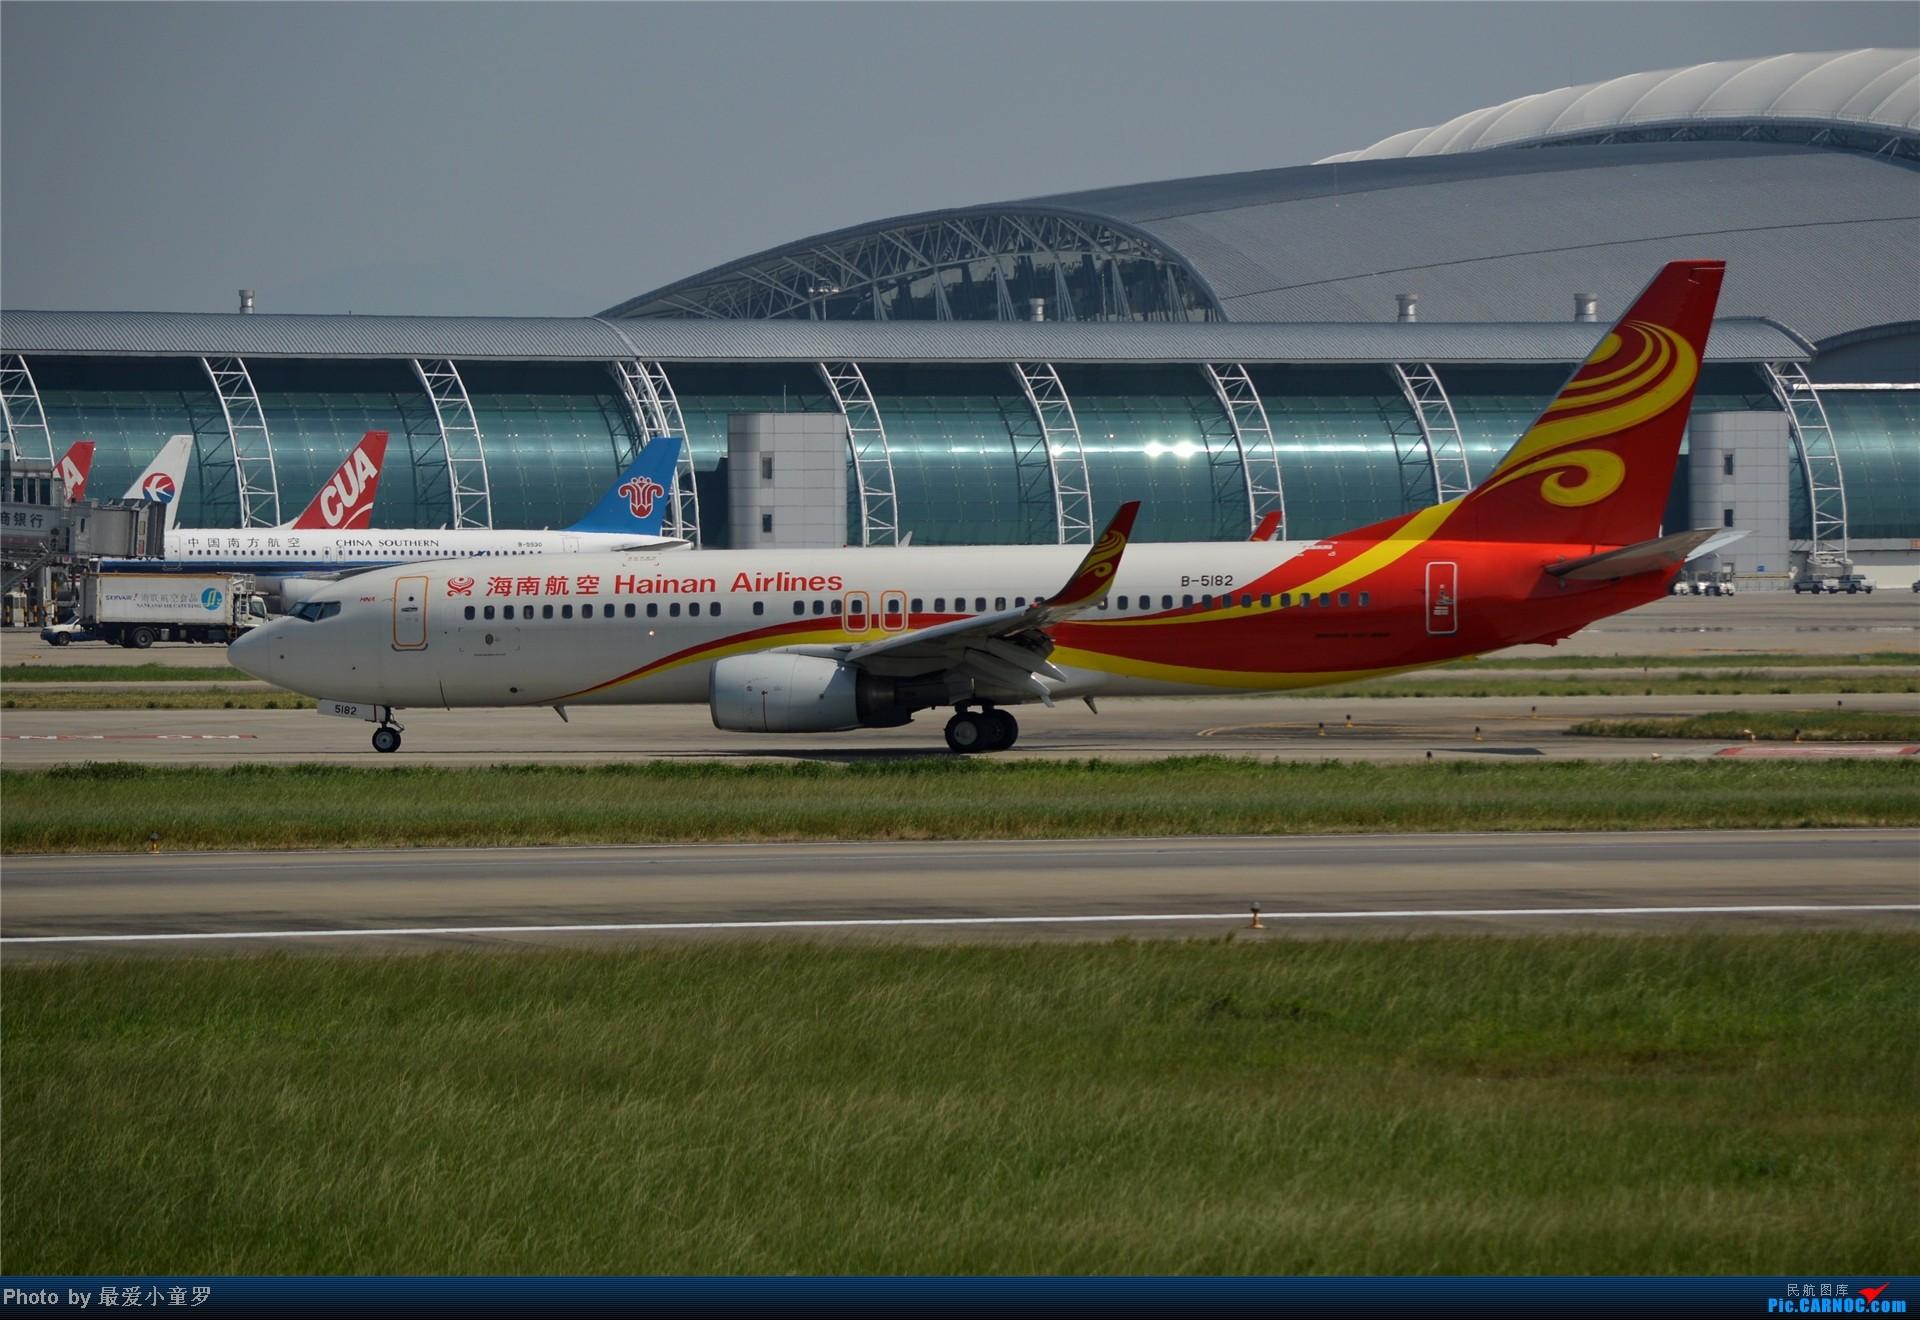 Re:[原创]炒冷饭贴之13年10月2日CAN拍机杂图系列 BOEING 737-800 B-5182 中国广州白云机场